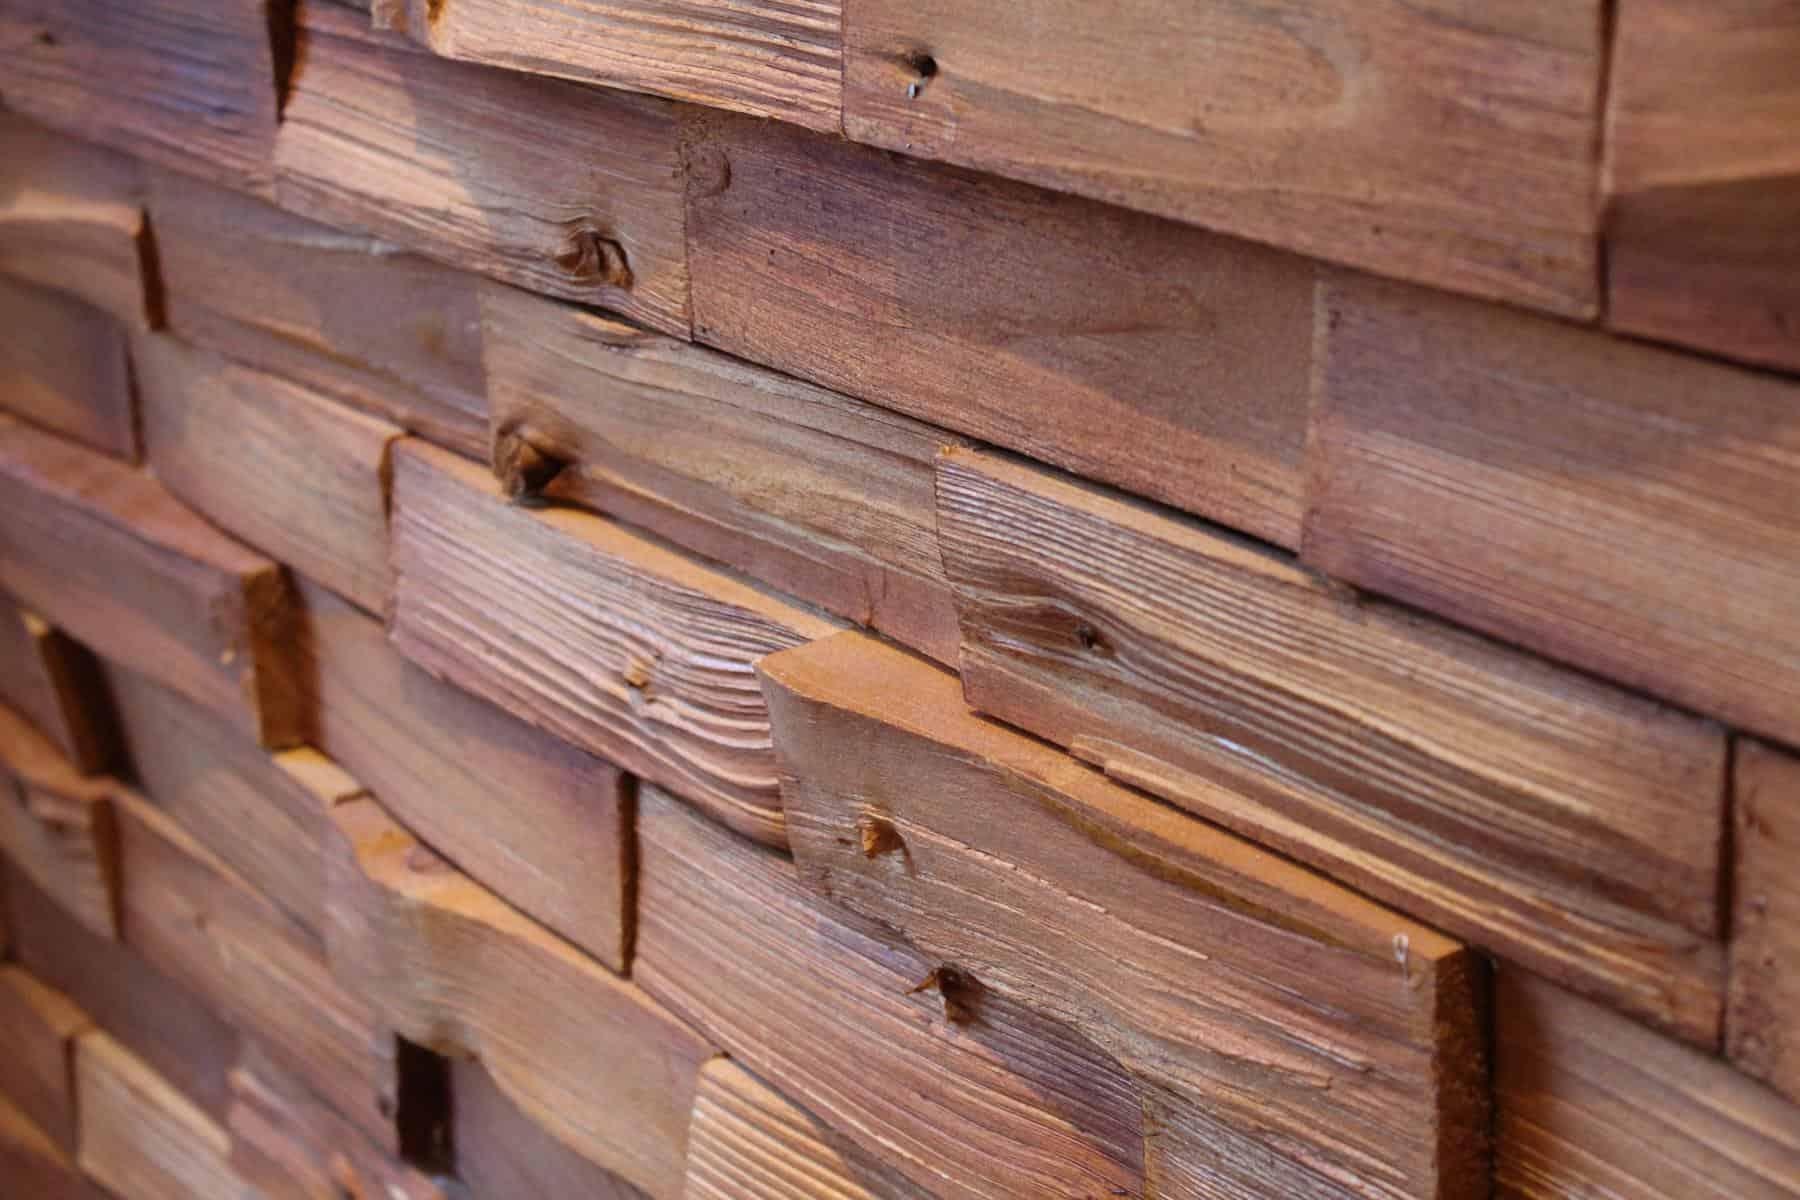 3D Wandverkleidung Holzverblender Spaltholz Wandverblender Spaltholzklinker